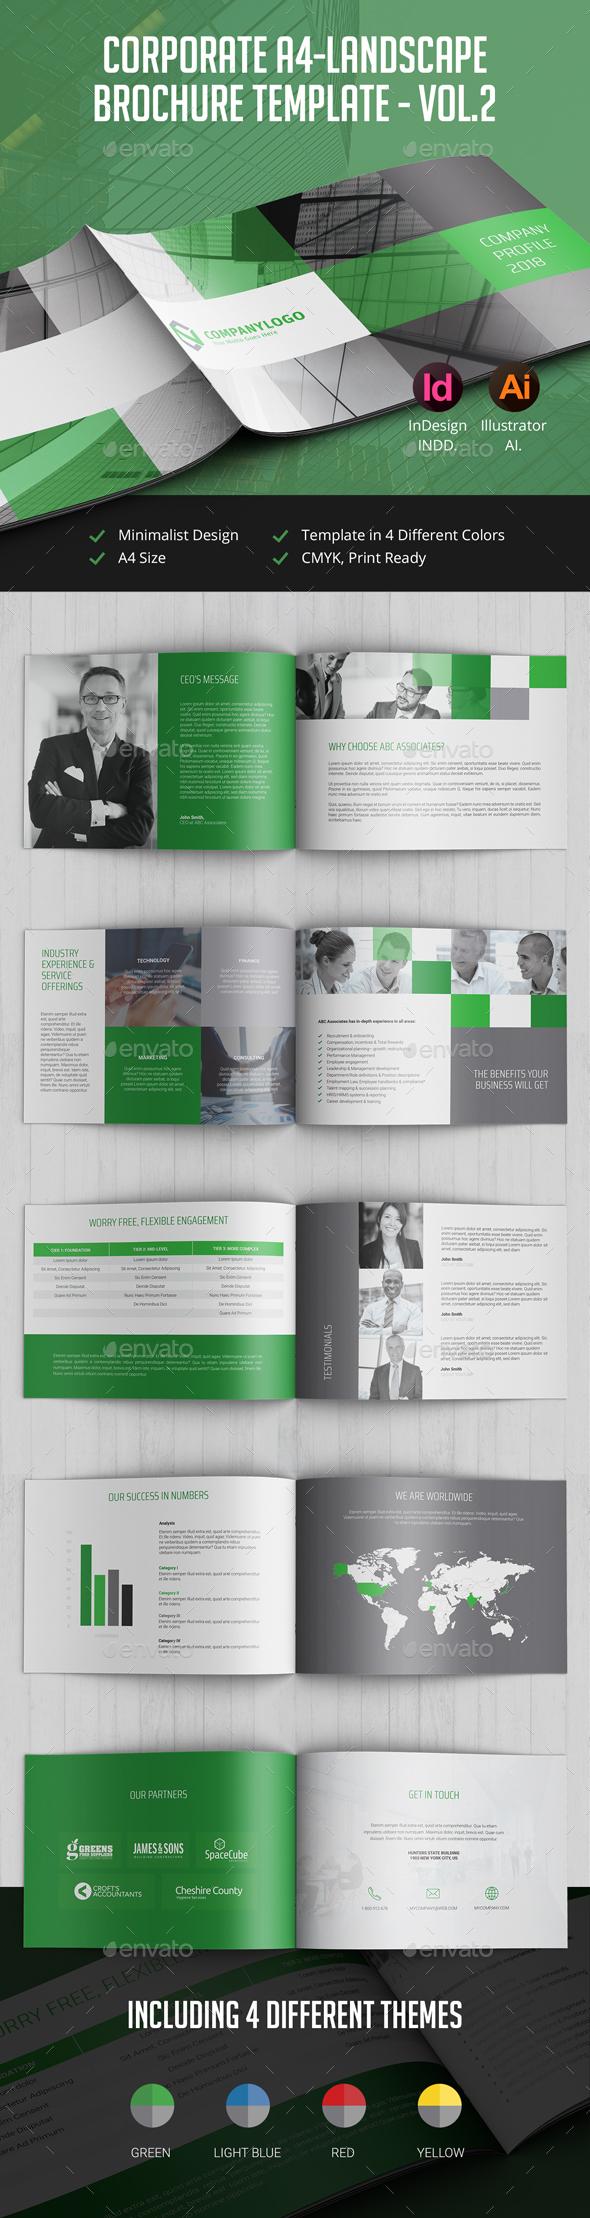 Corporate Landscape Brochure vol.2 - Corporate Brochures